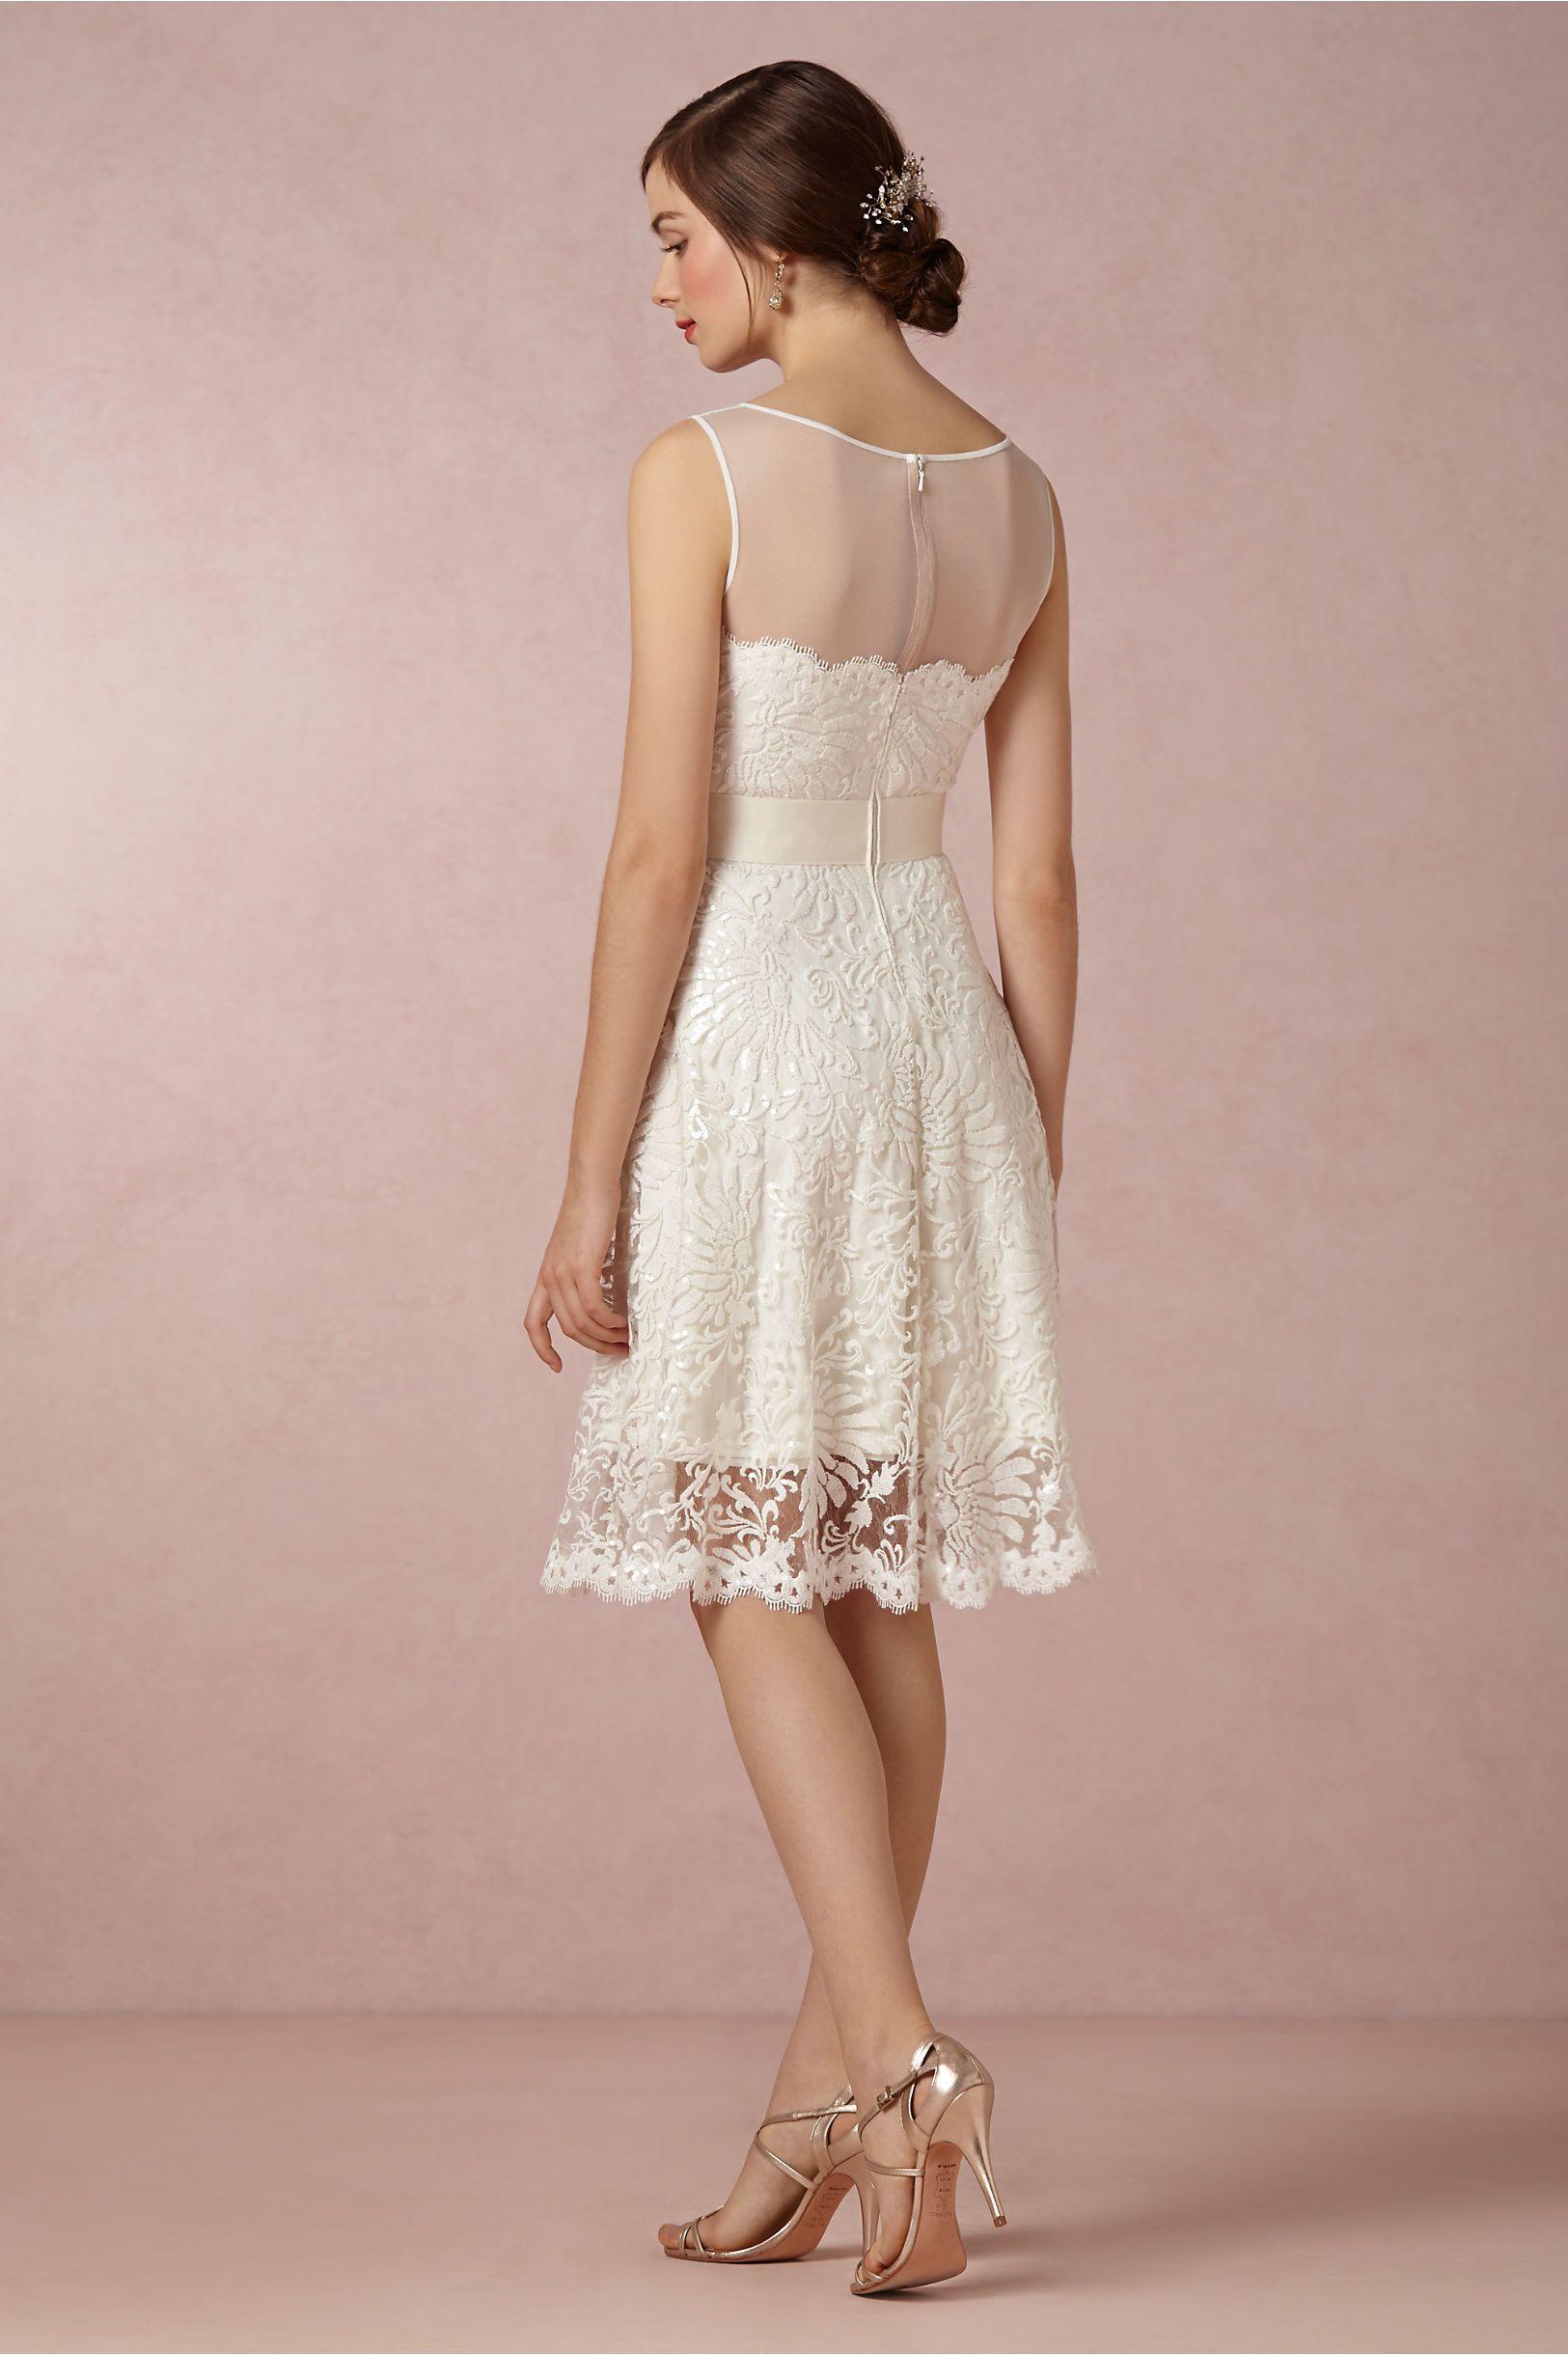 Vestido para dia - renda (costas) | Wedding Inspiration | Pinterest ...